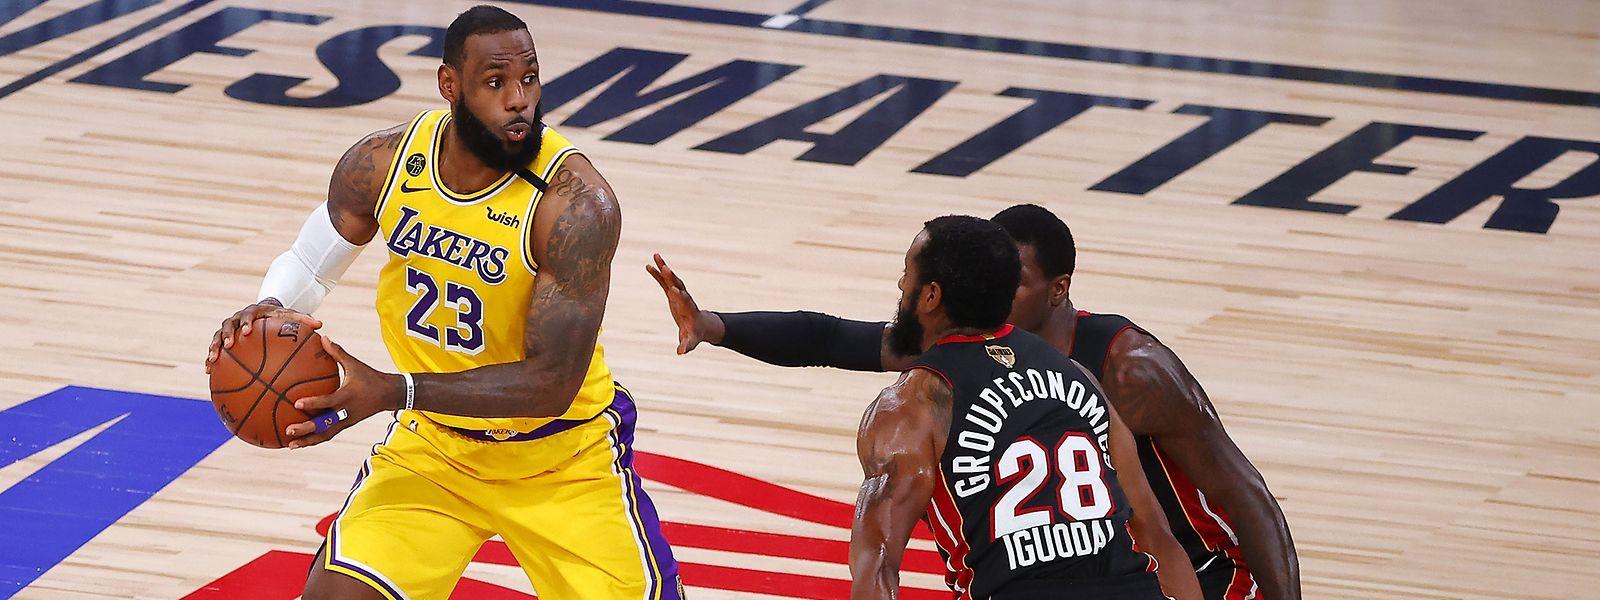 LeBron James (l.) drückt dem Spiel seinen Stempel auf.